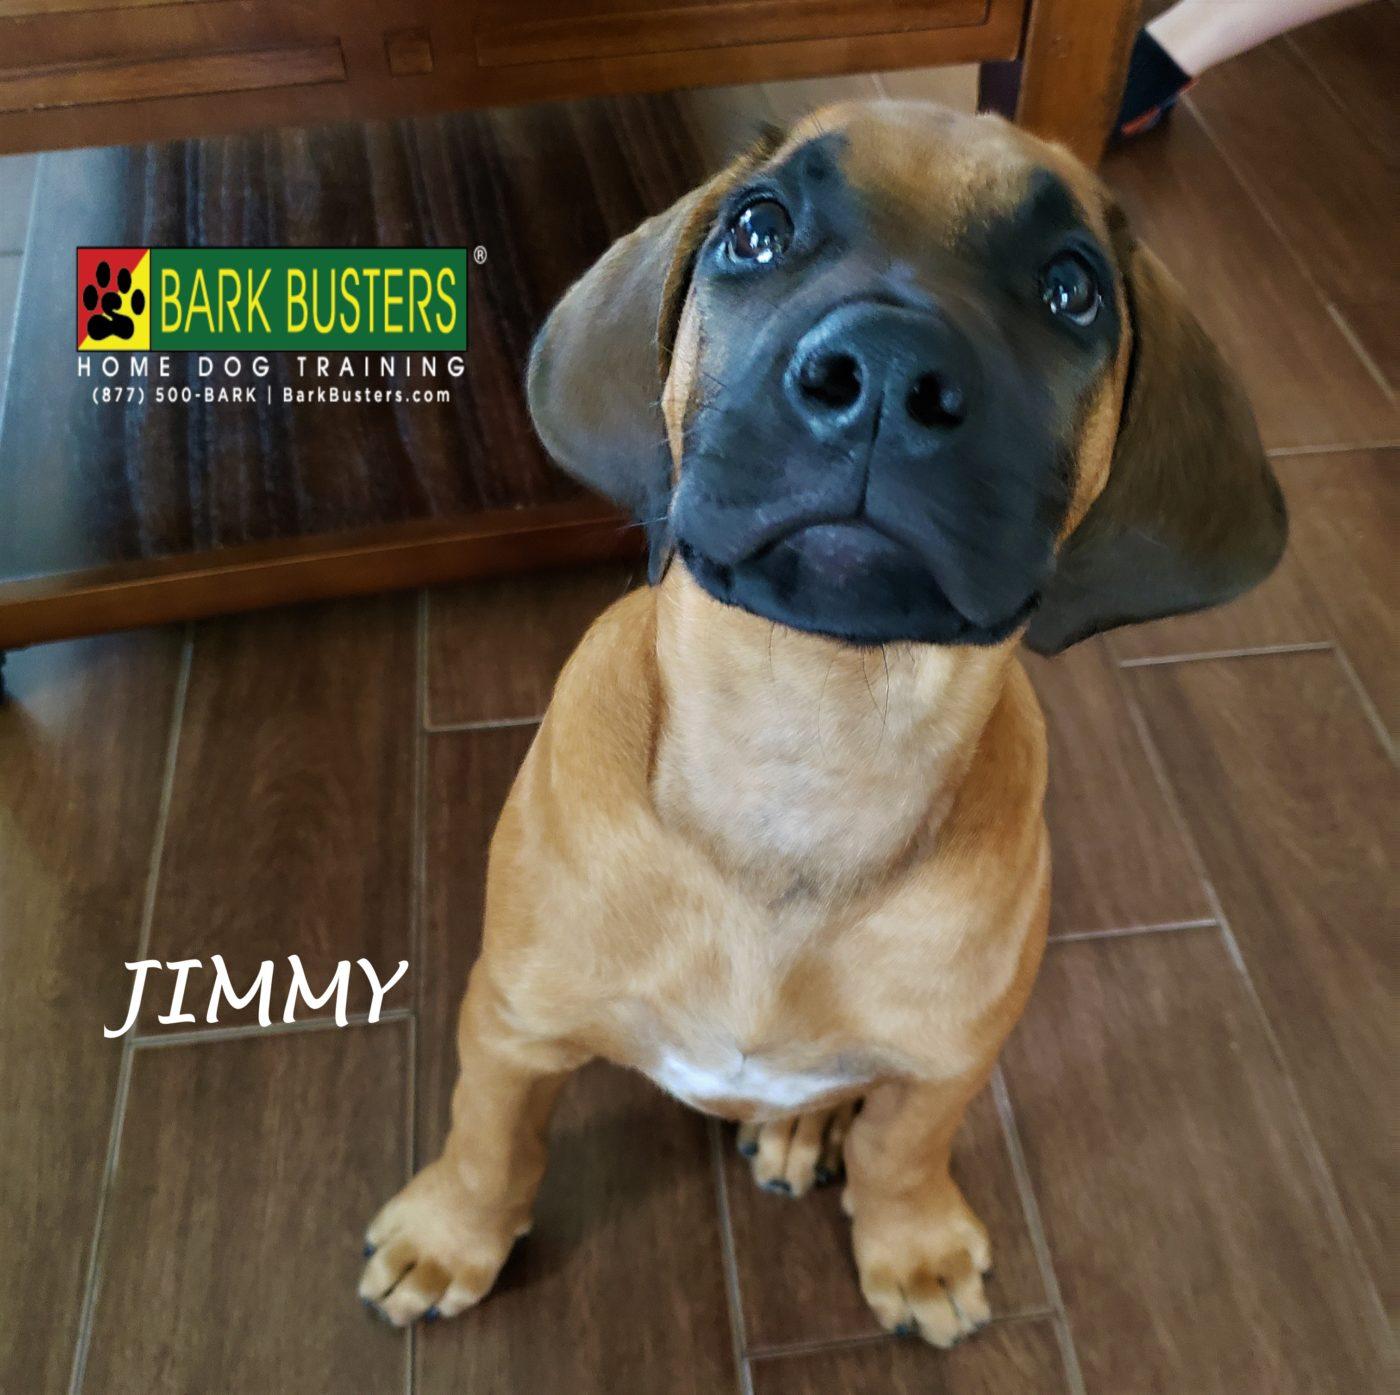 #rhodesianridgeback #puppytraining #dogtrainingroundrock #dogtrainernearme #barkbusters #speakdog #inhomedogtraining